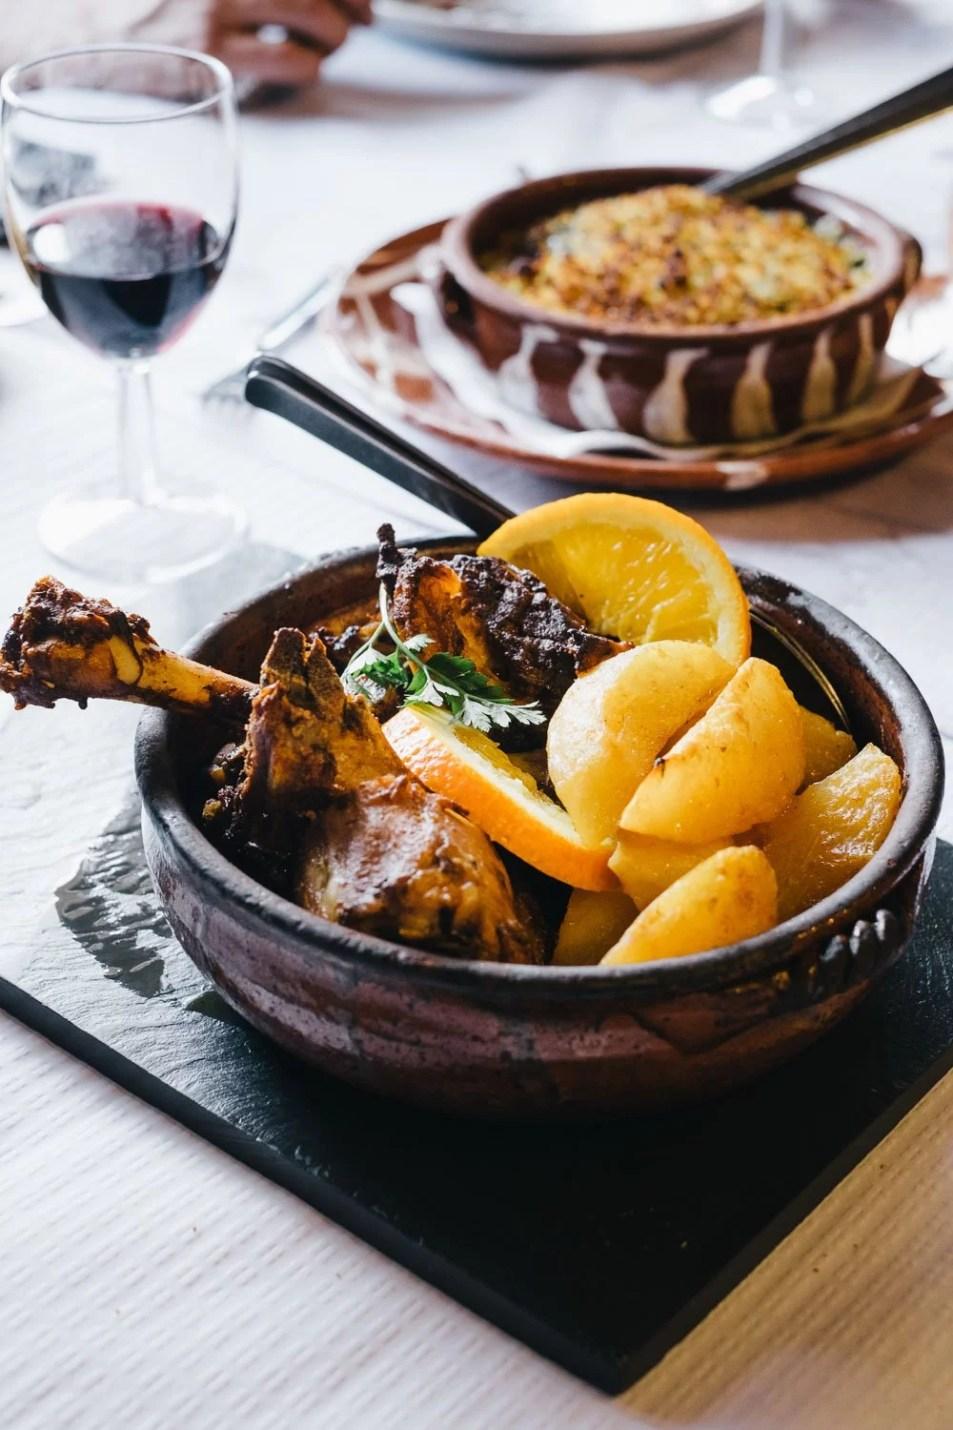 Serra da Estrela - Restaurante Varanda da Estrela